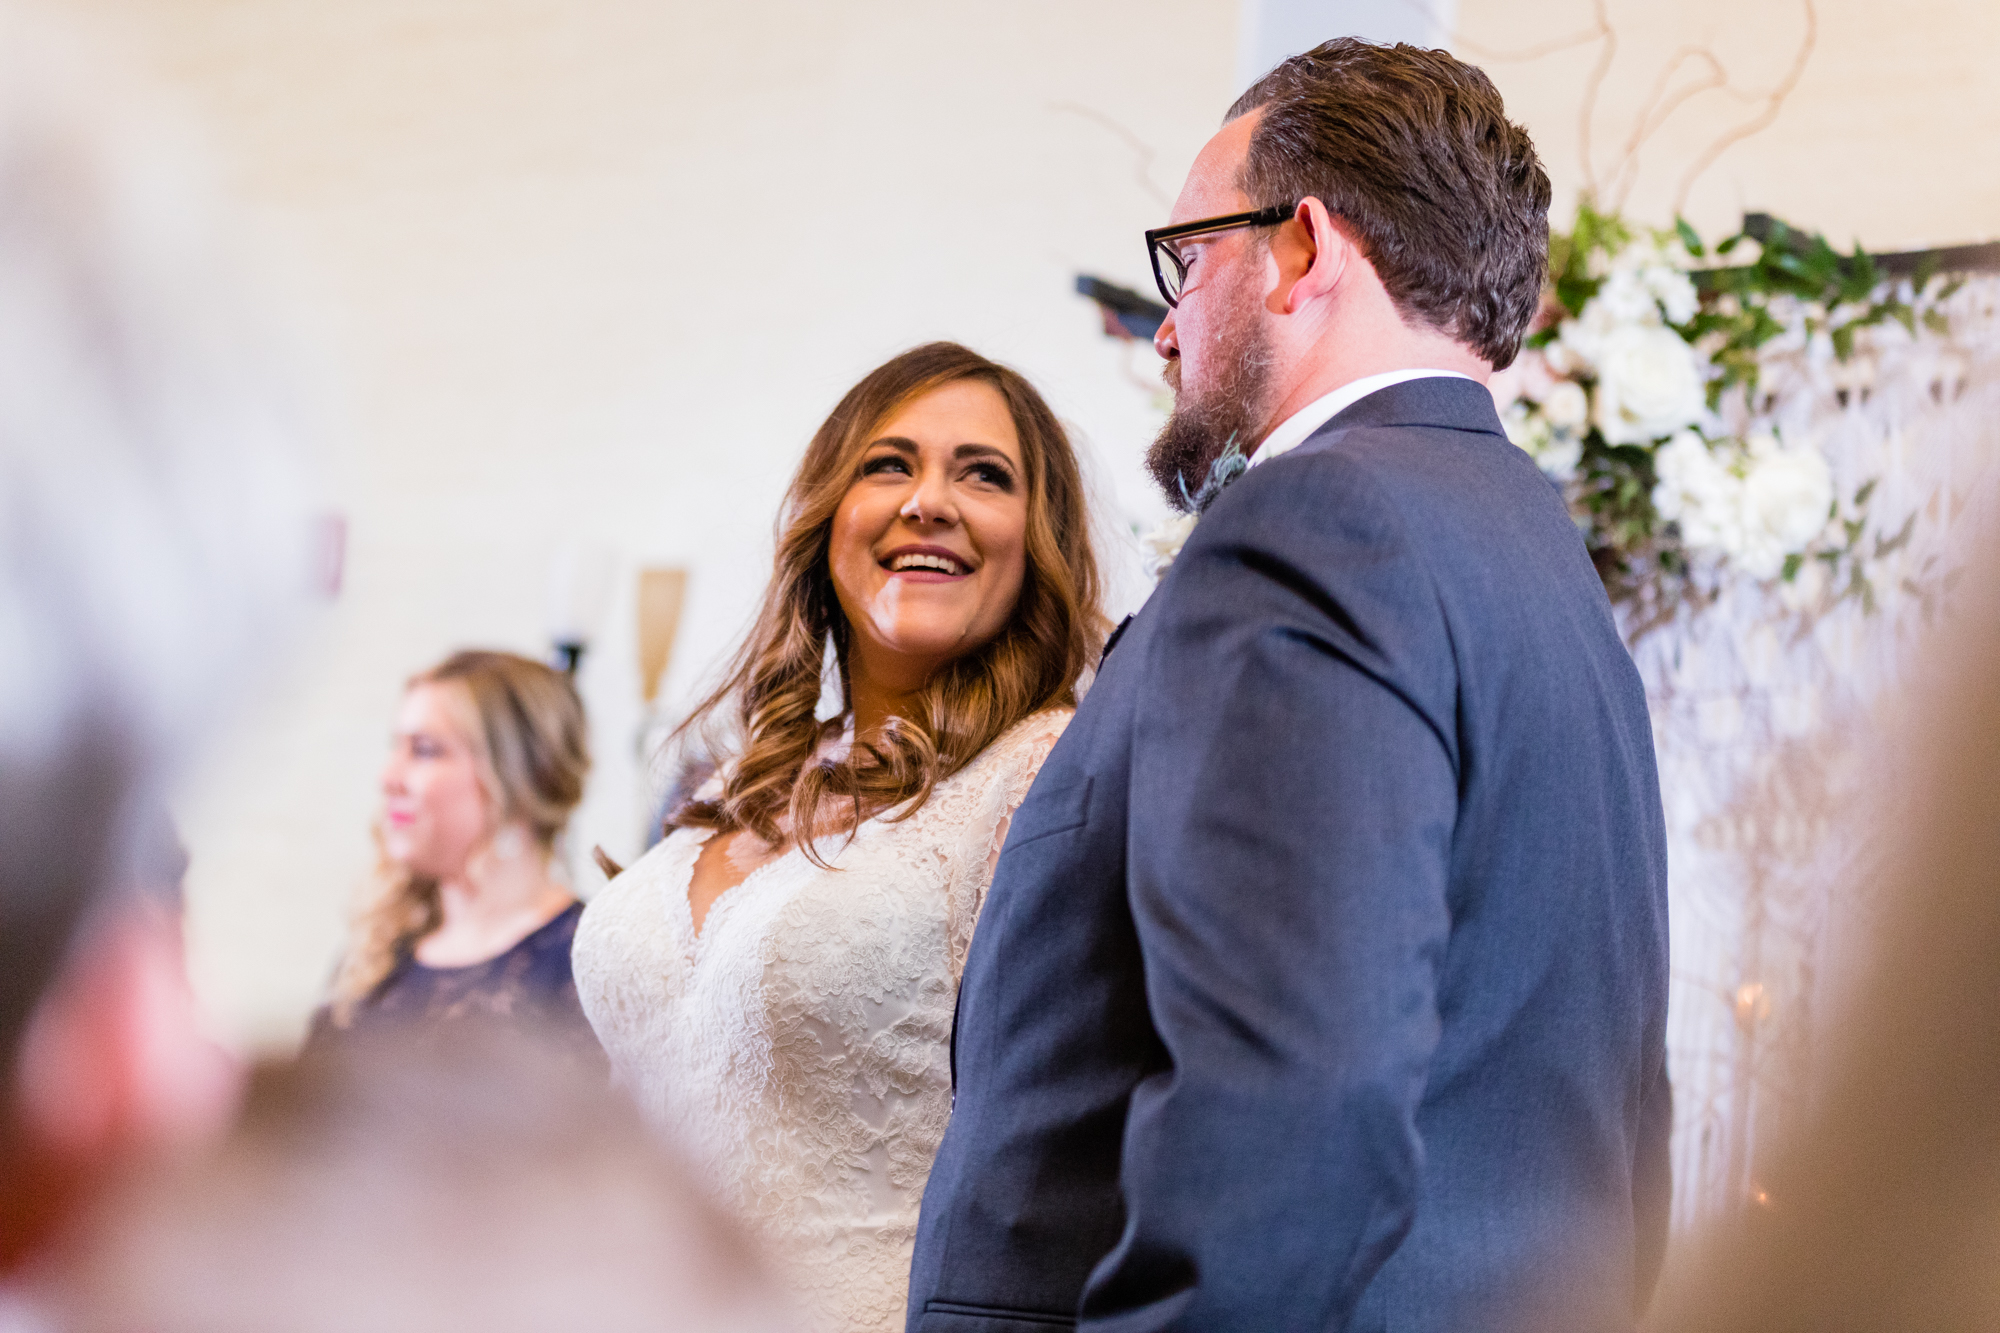 Bear Creek Mountain Resort Wedding Photography - Lovestruck Pictures-075.jpg